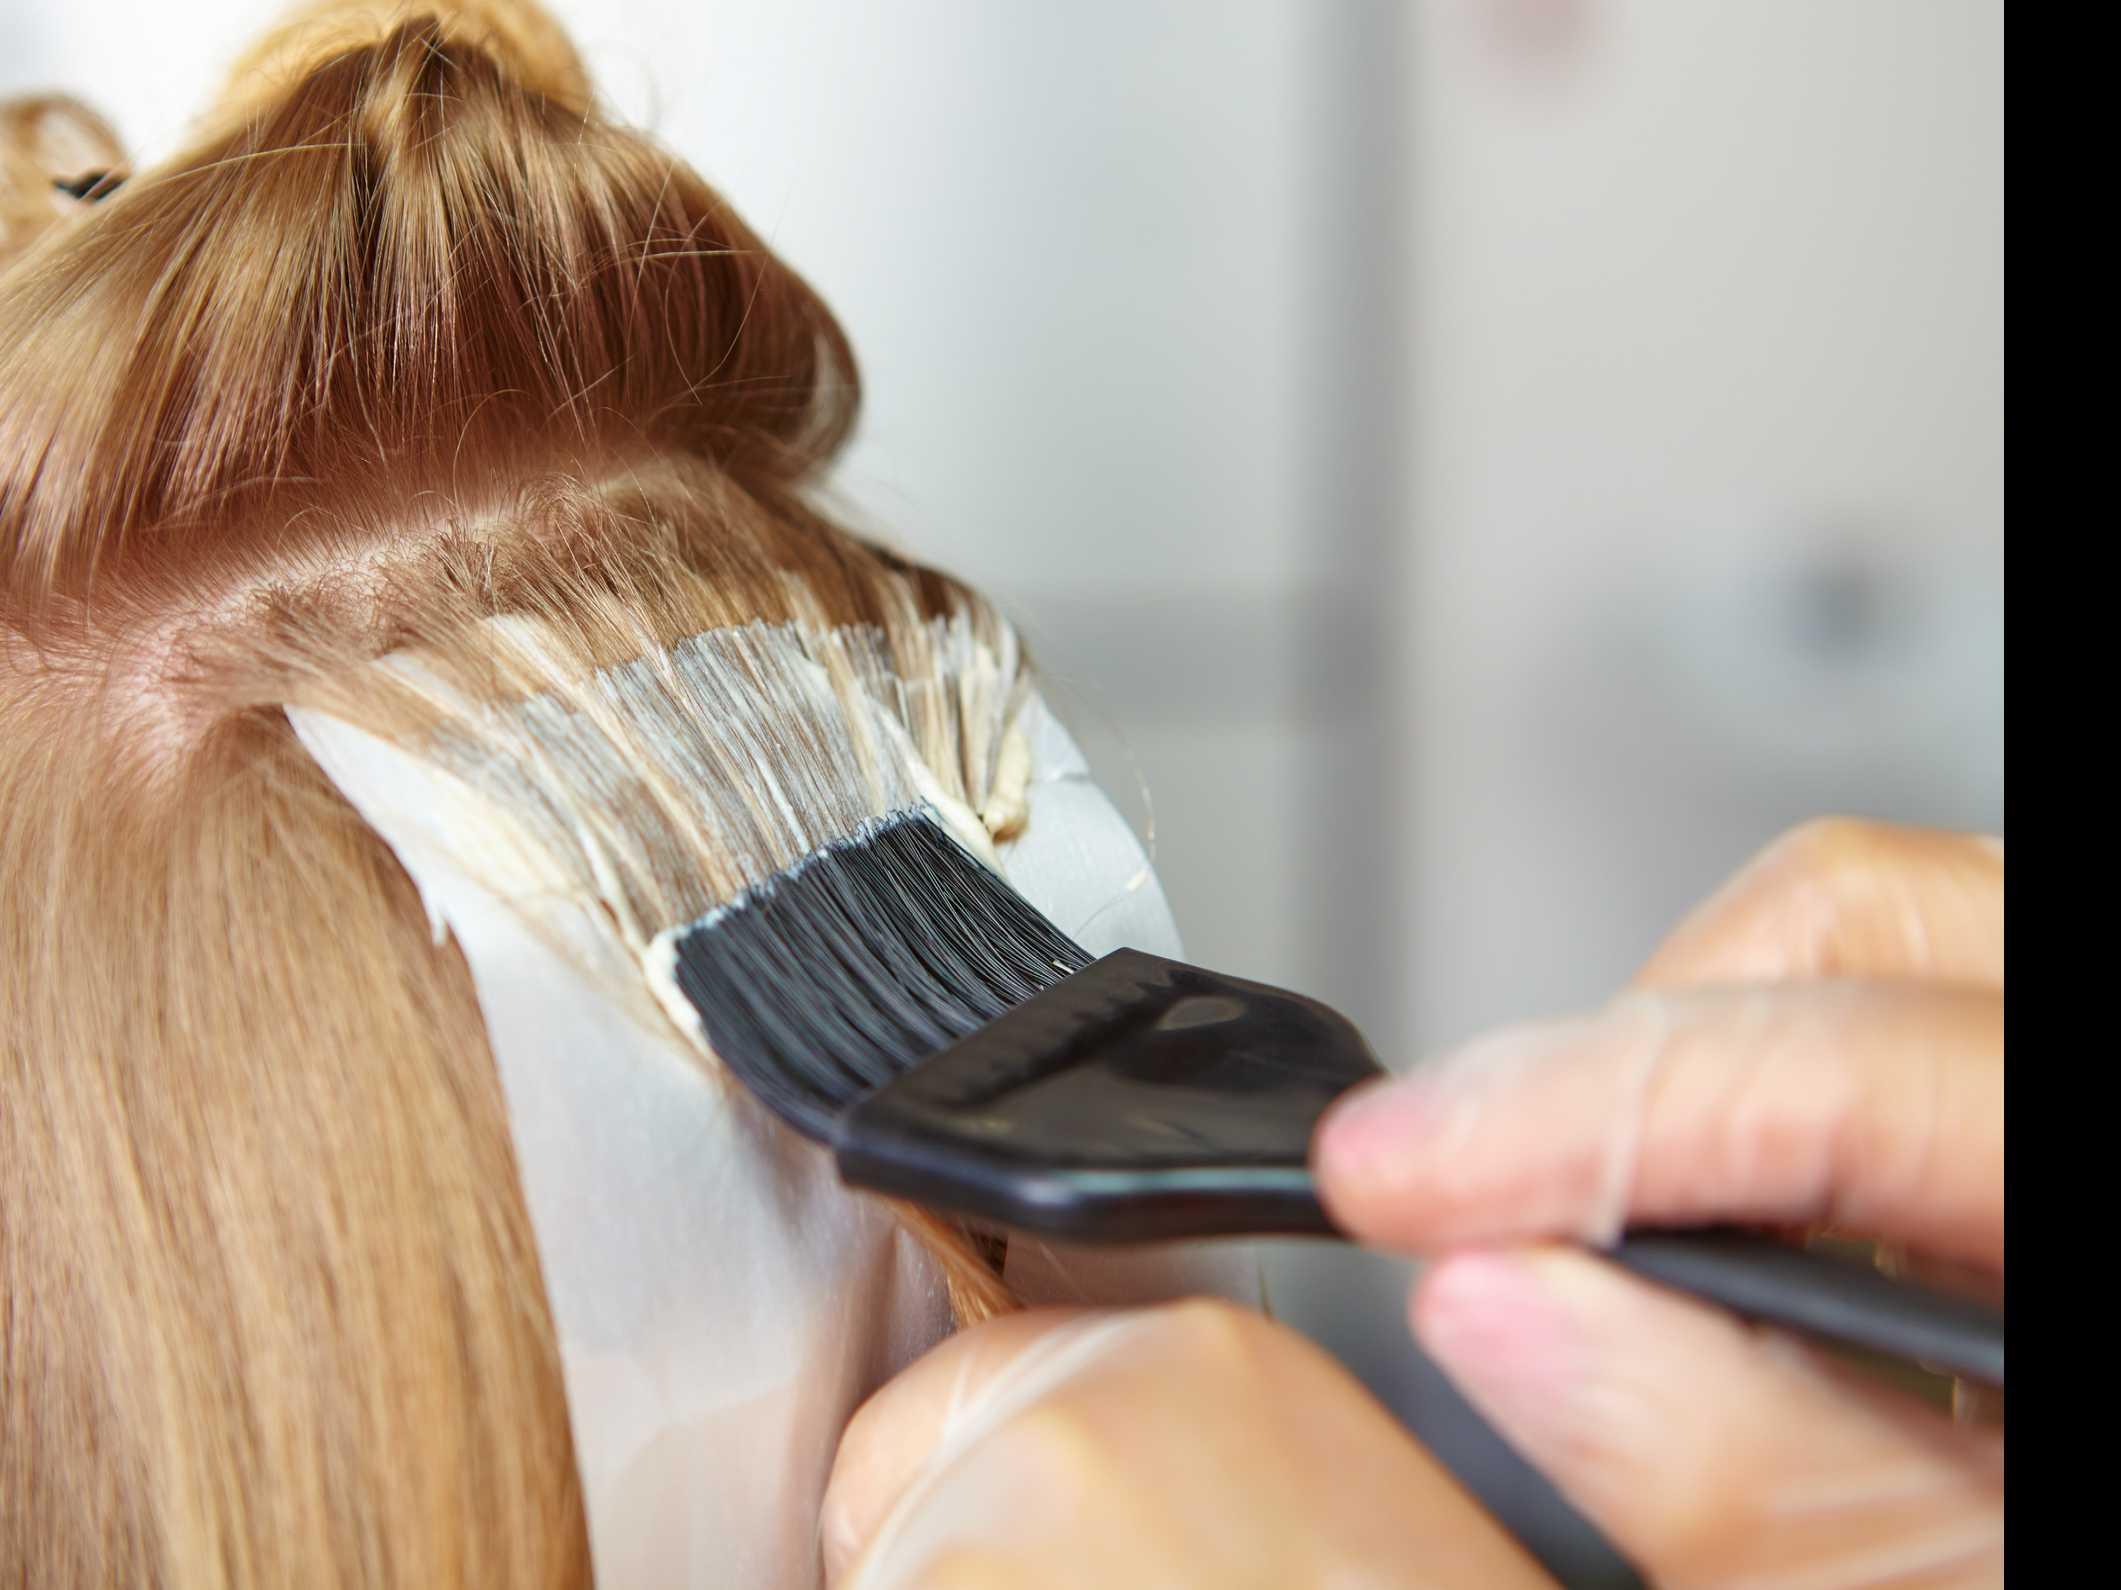 German Court: Model Deserves Damages for Disastrous Hair Dye